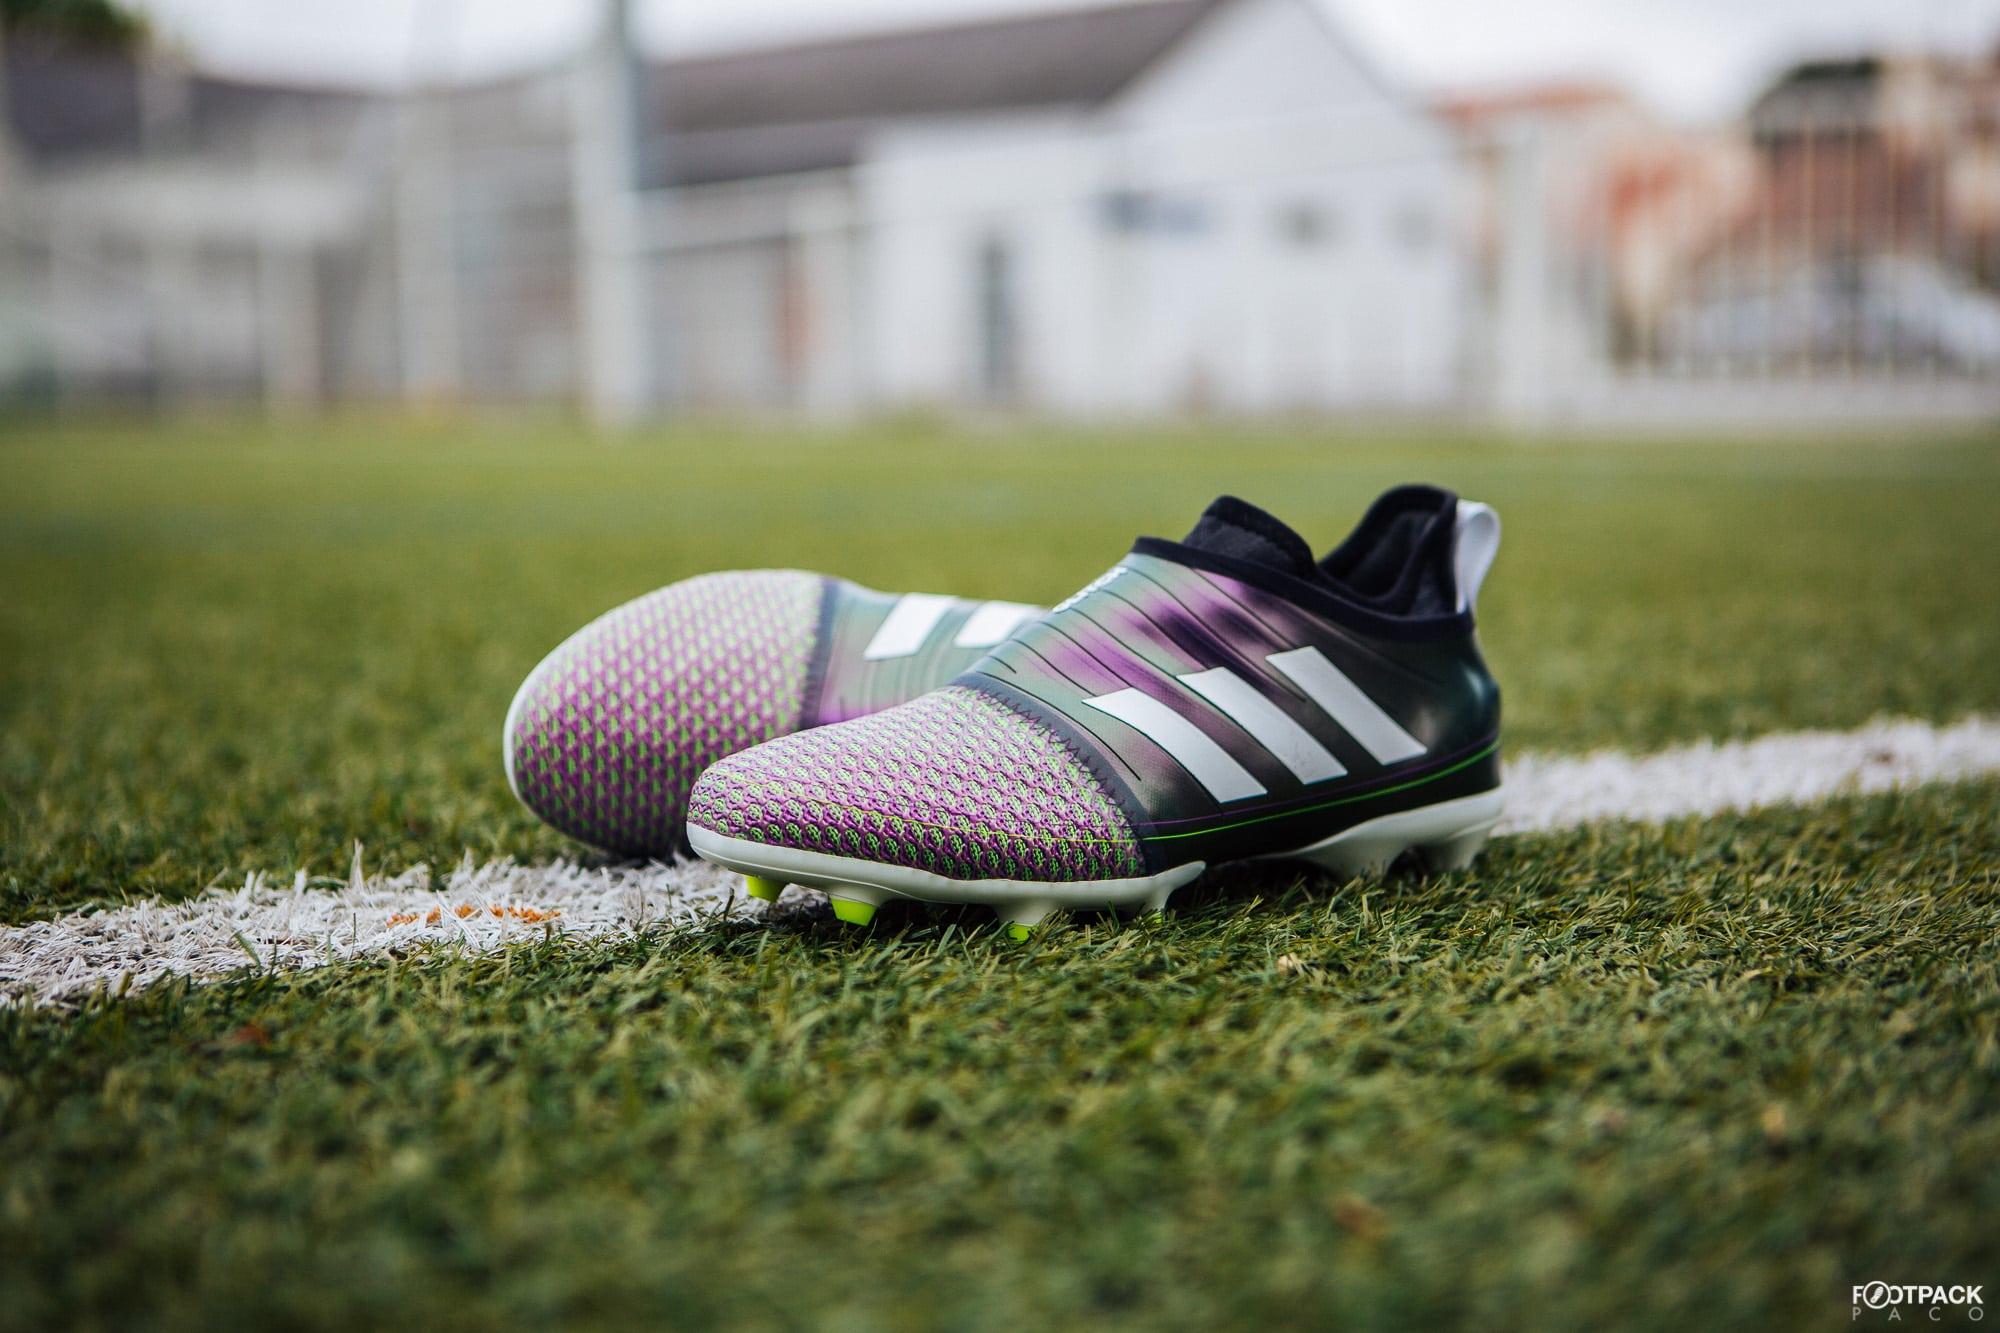 Chaussures-football-adidas-glitch-f50-mai-2018-4